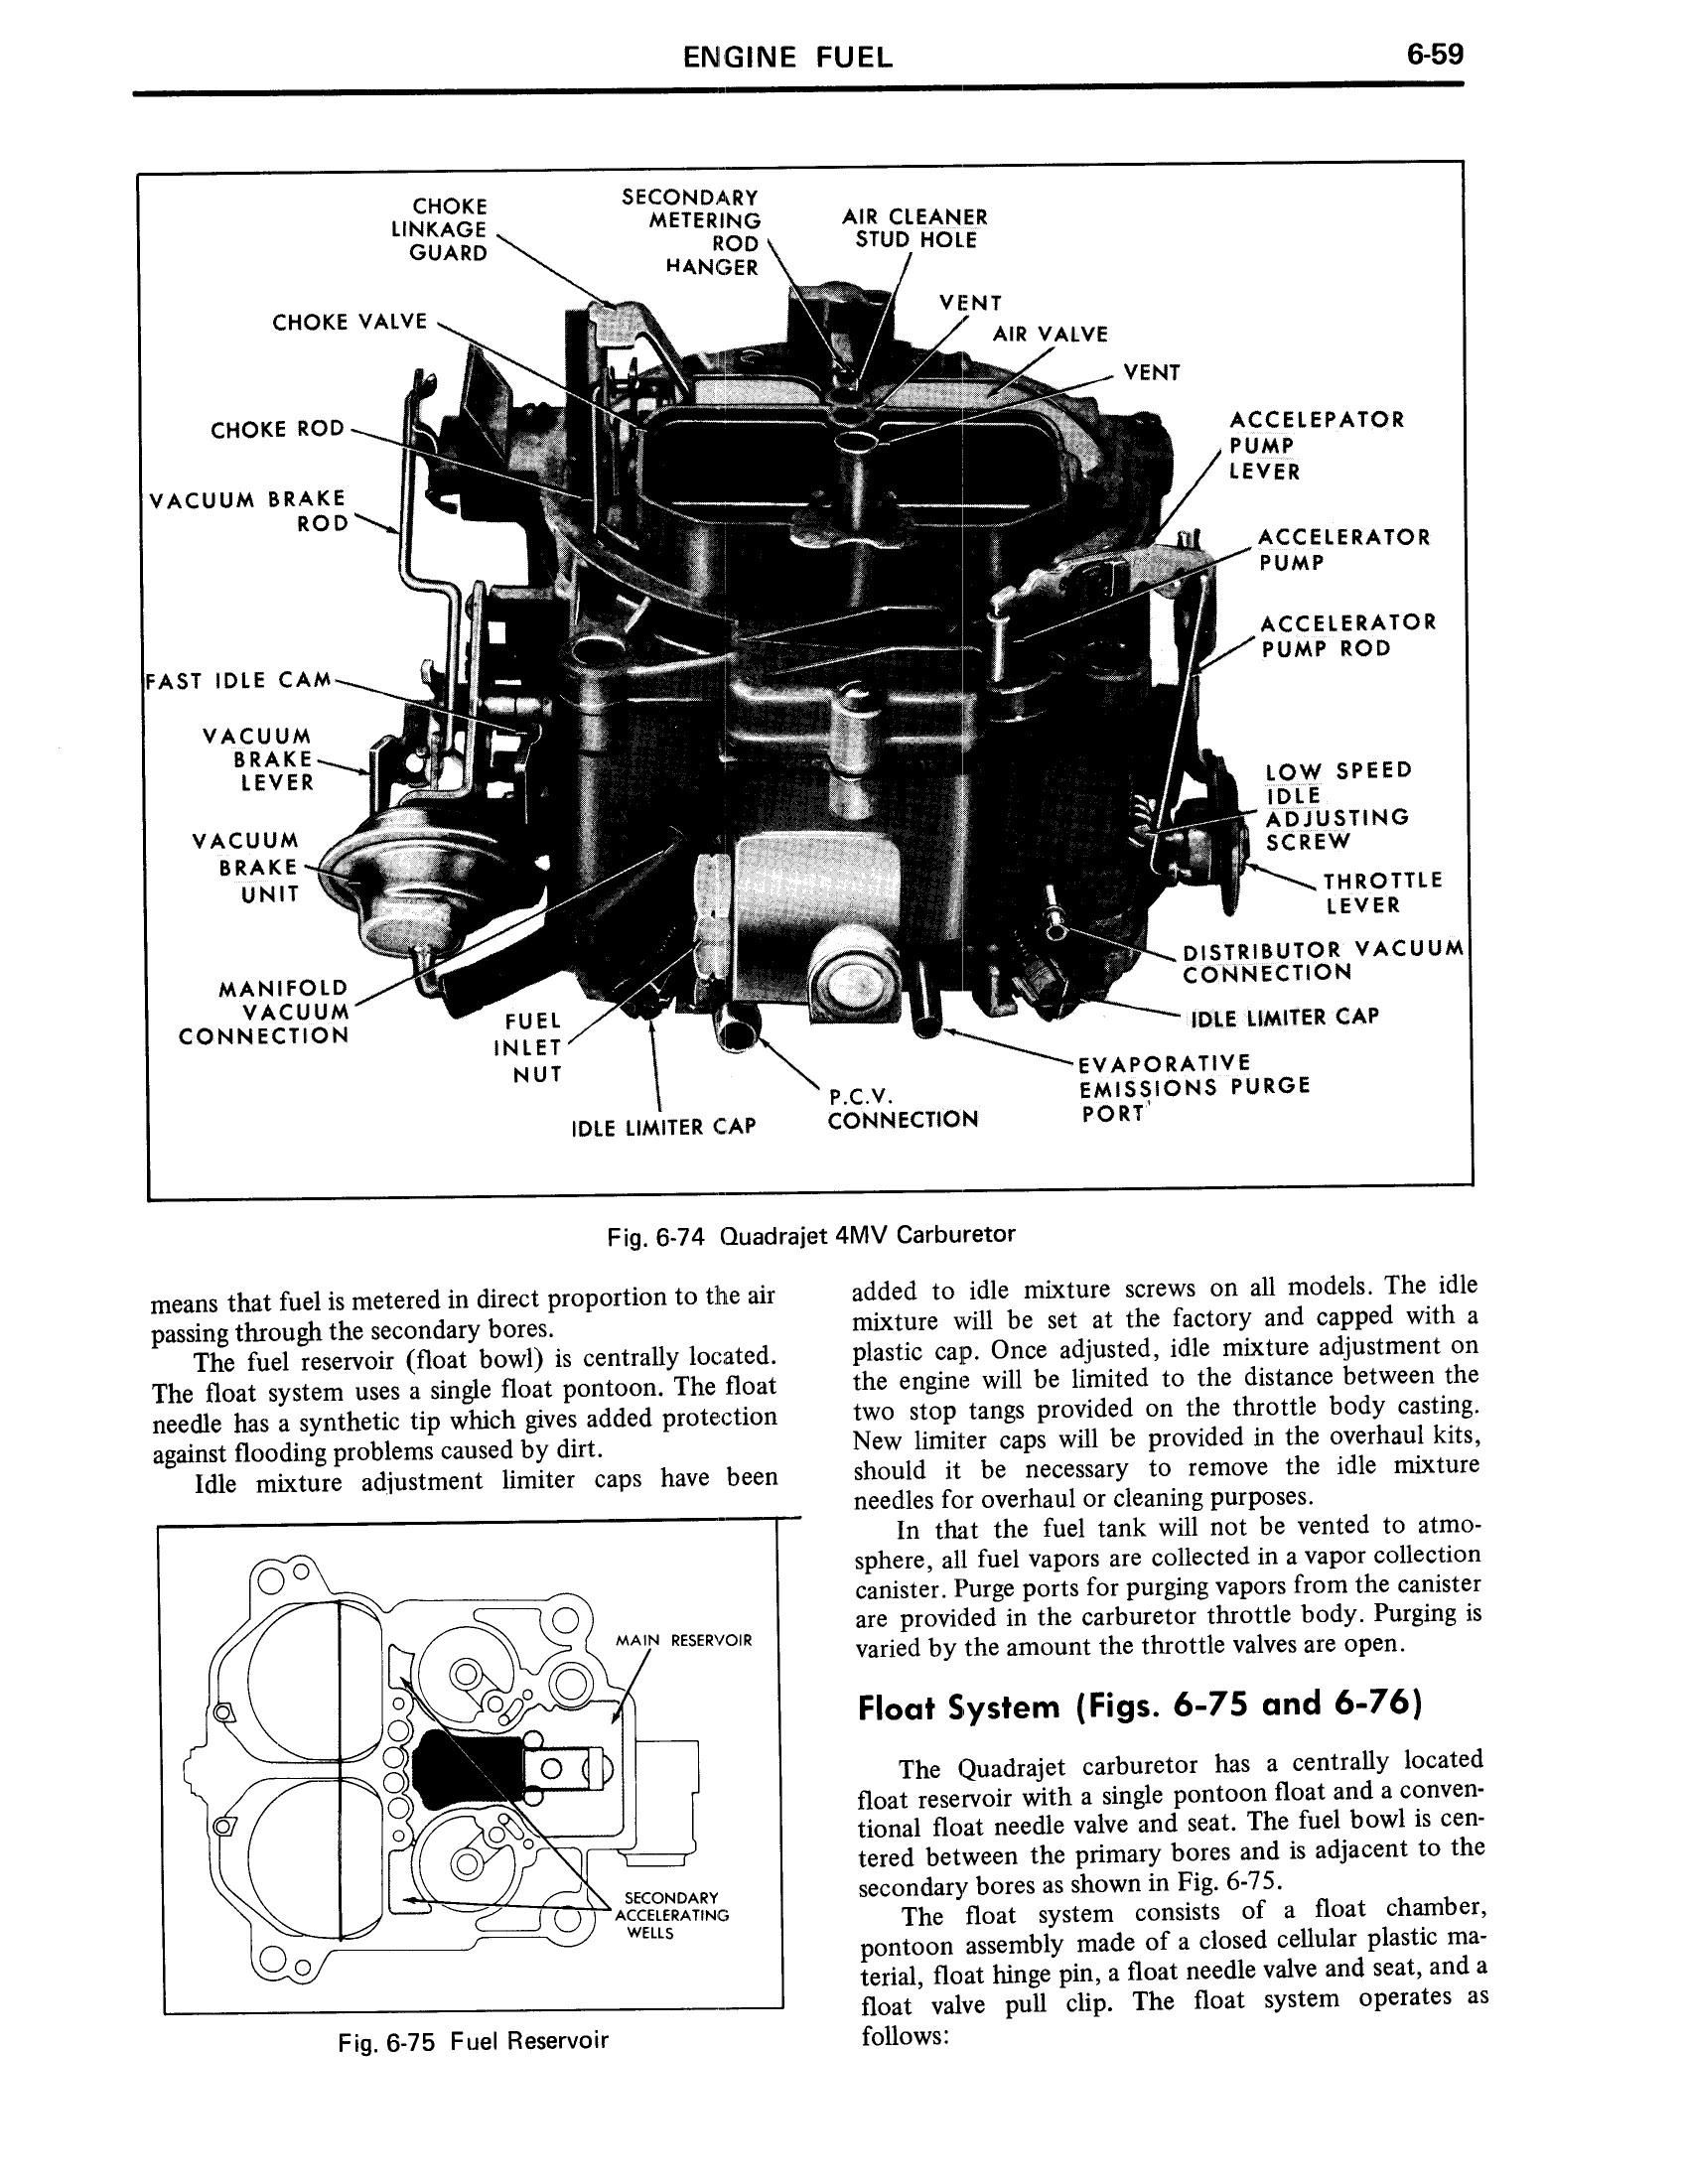 1971 Cadillac Shop Manual- Engine Page 59 of 128